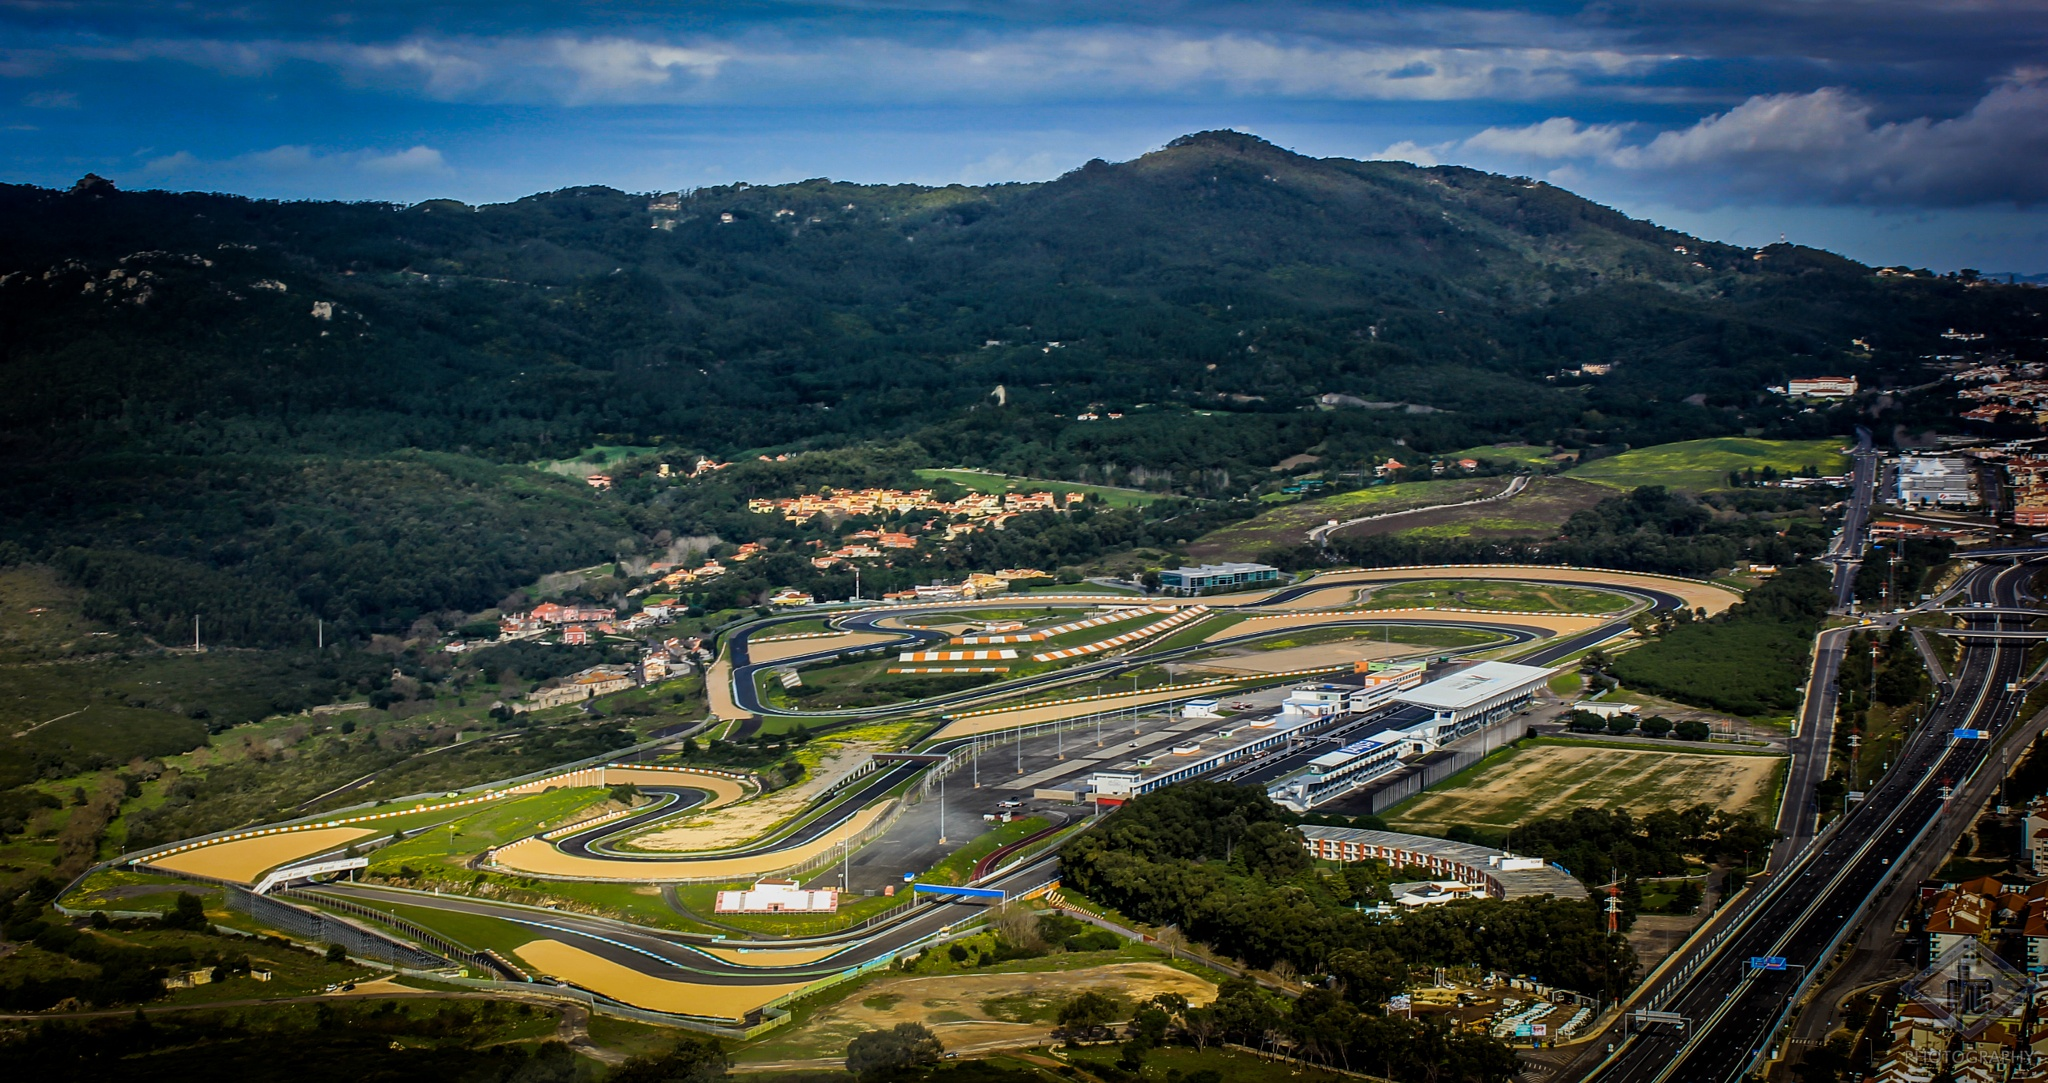 Autódromo do Estoril by LuisFilipeCorreia